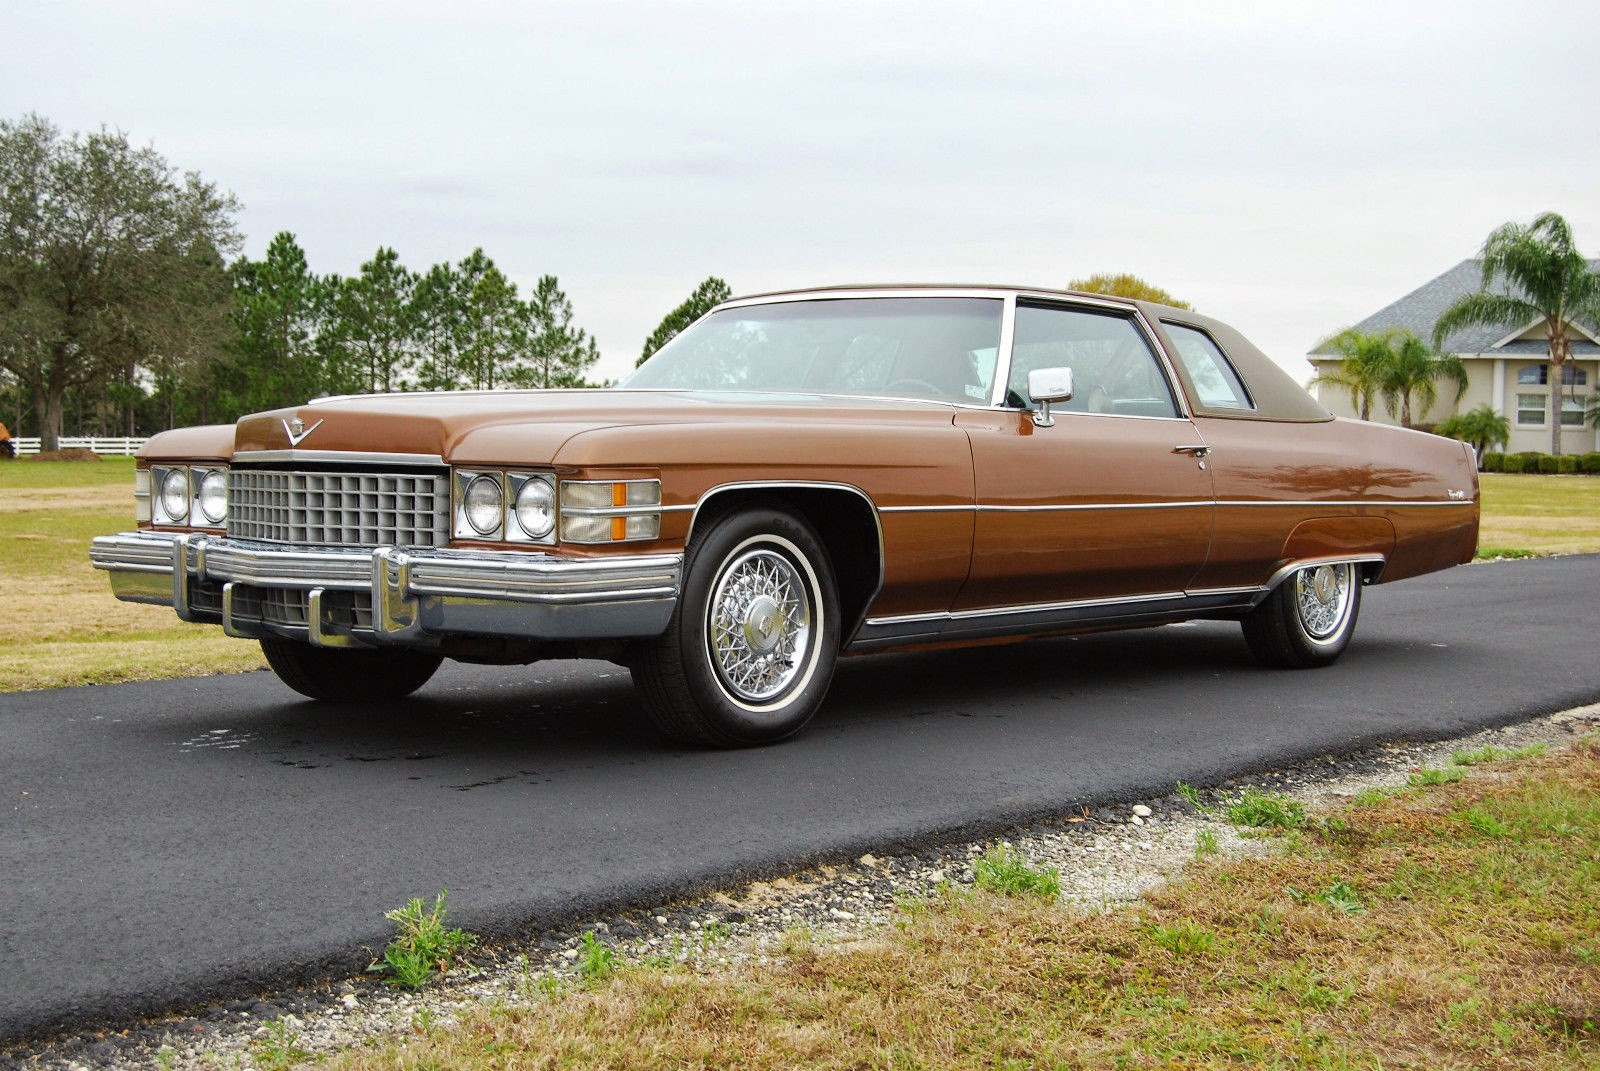 All American Classic Cars: 1974 Cadillac Coupe de Ville 2 ...